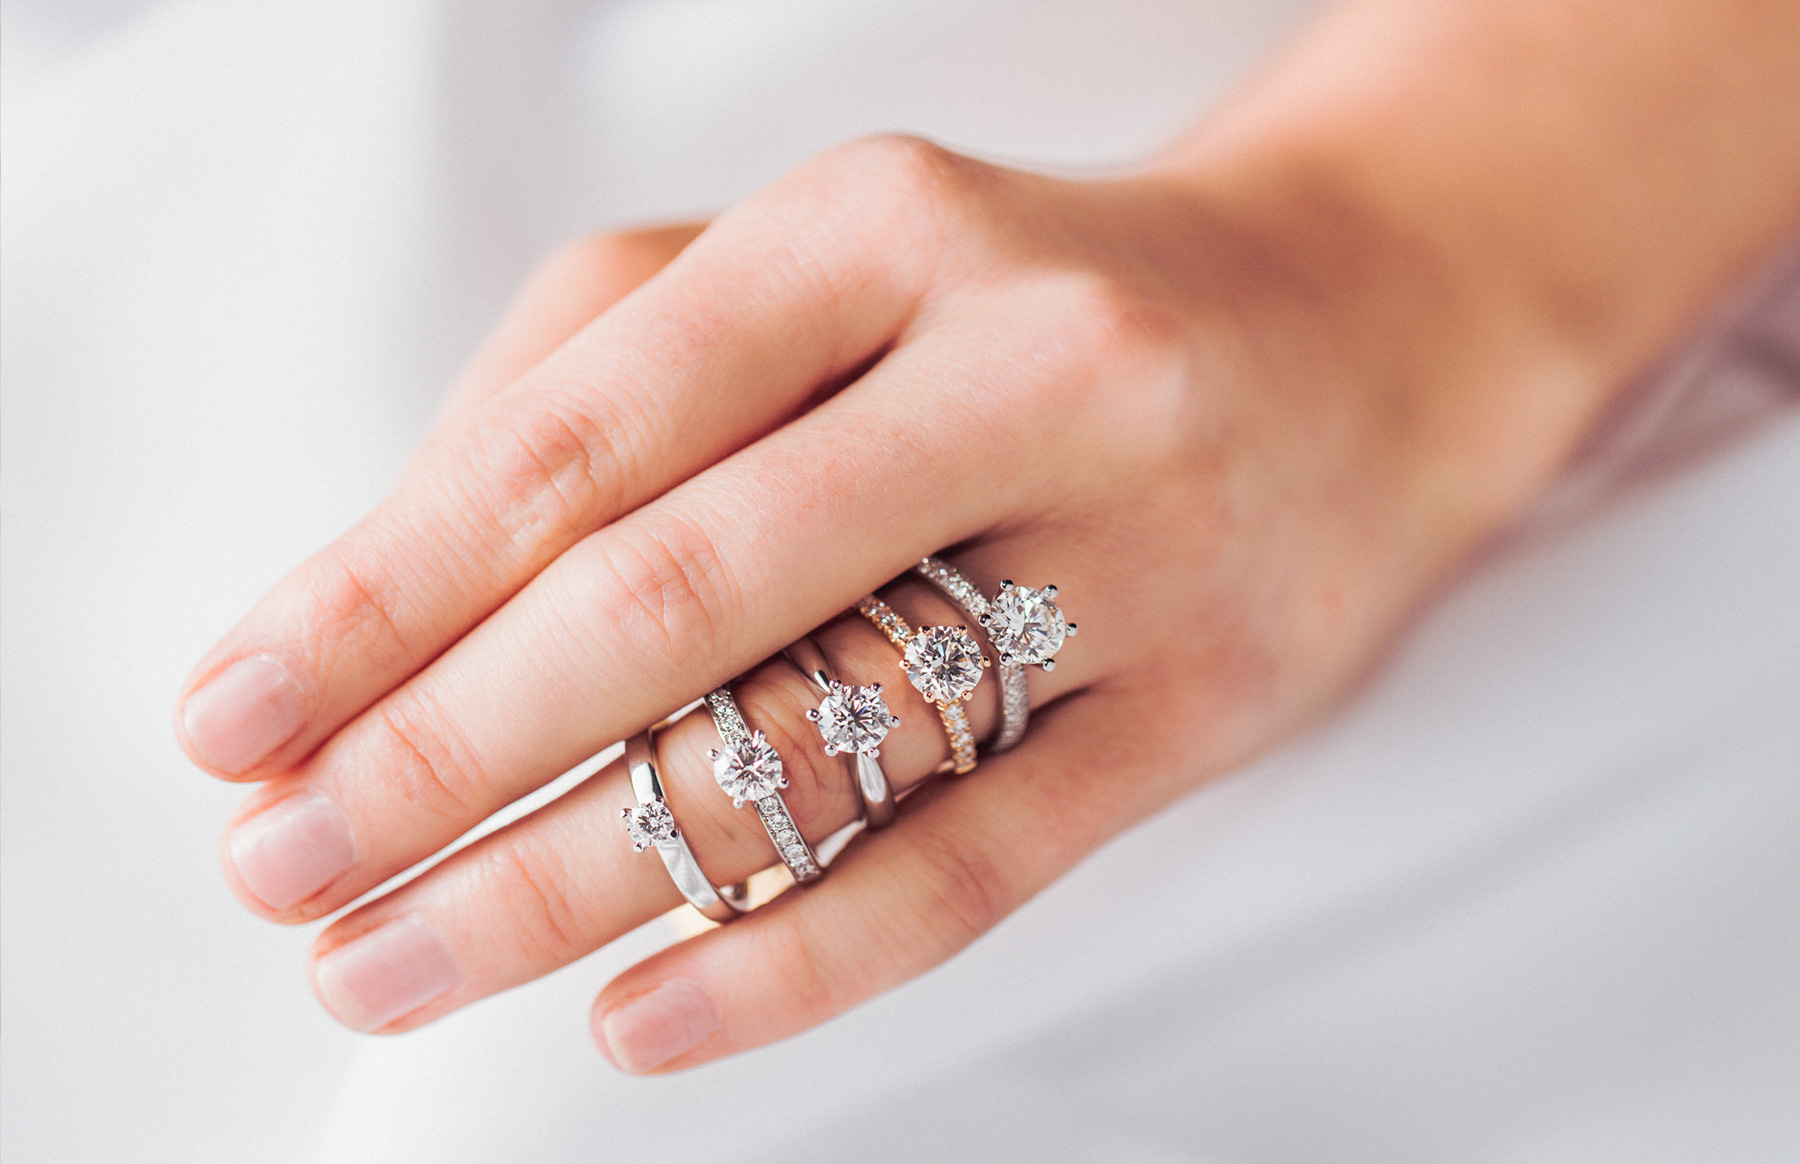 vad kostar 1 carat diamant